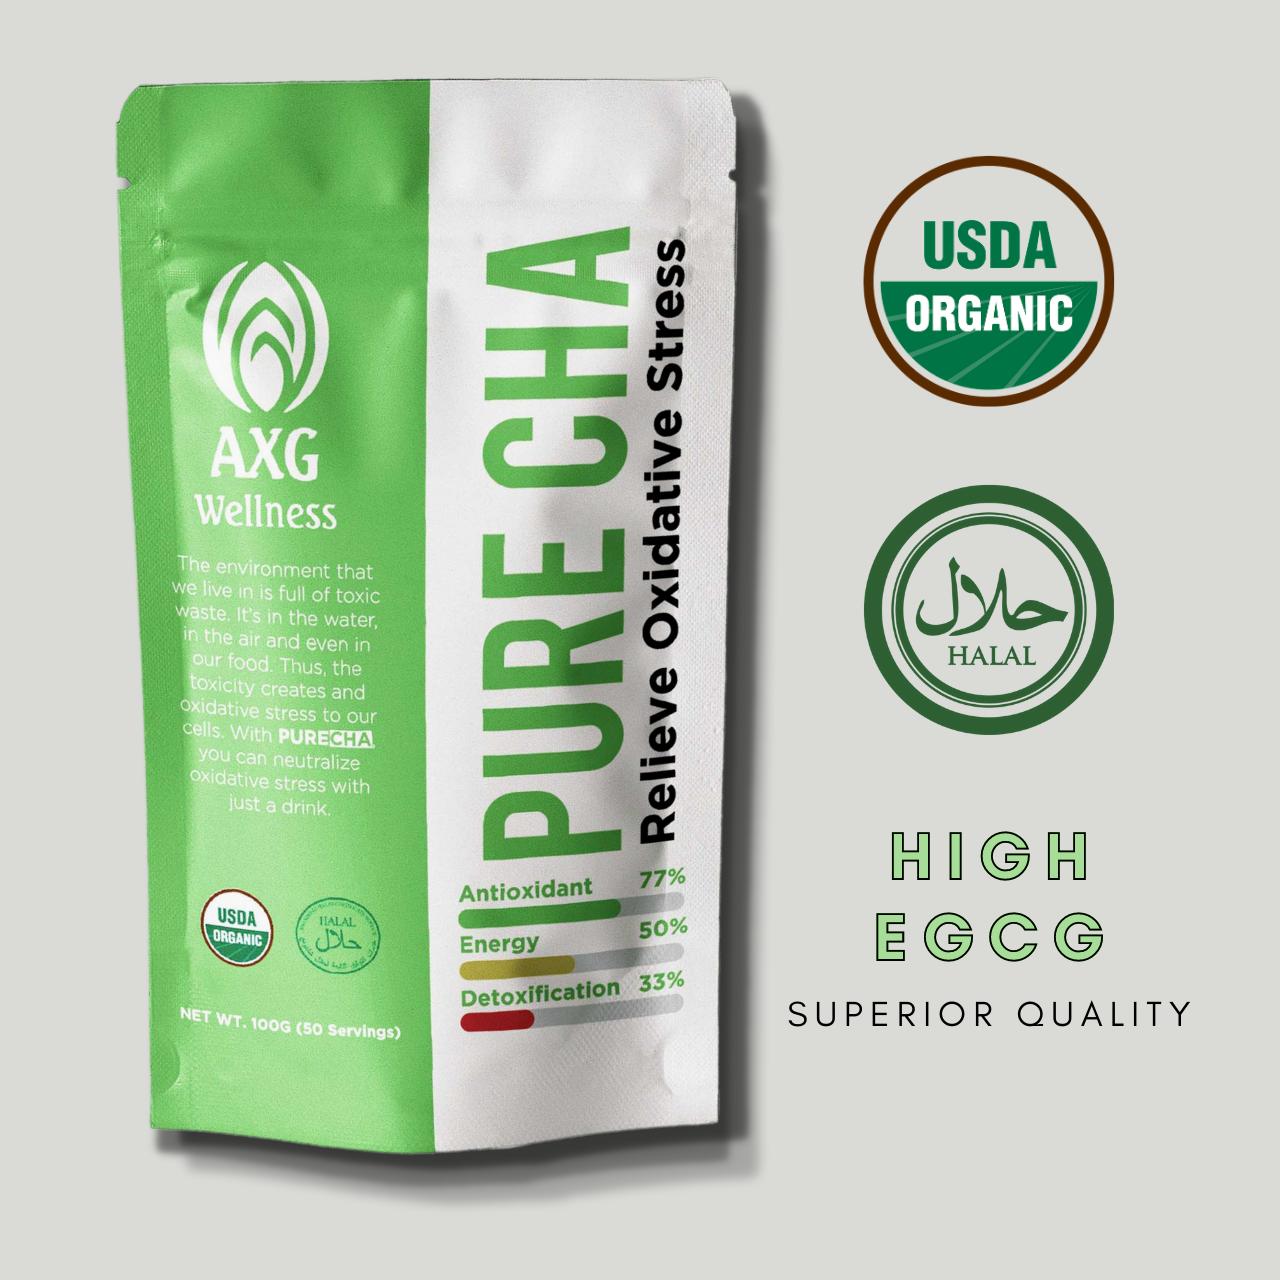 PURECHA Serbuk Matcha Ceremonial Grade -  Tinggi dengan Antioksidan - 100% Organik [HALAL] [USDA ORGANIC]